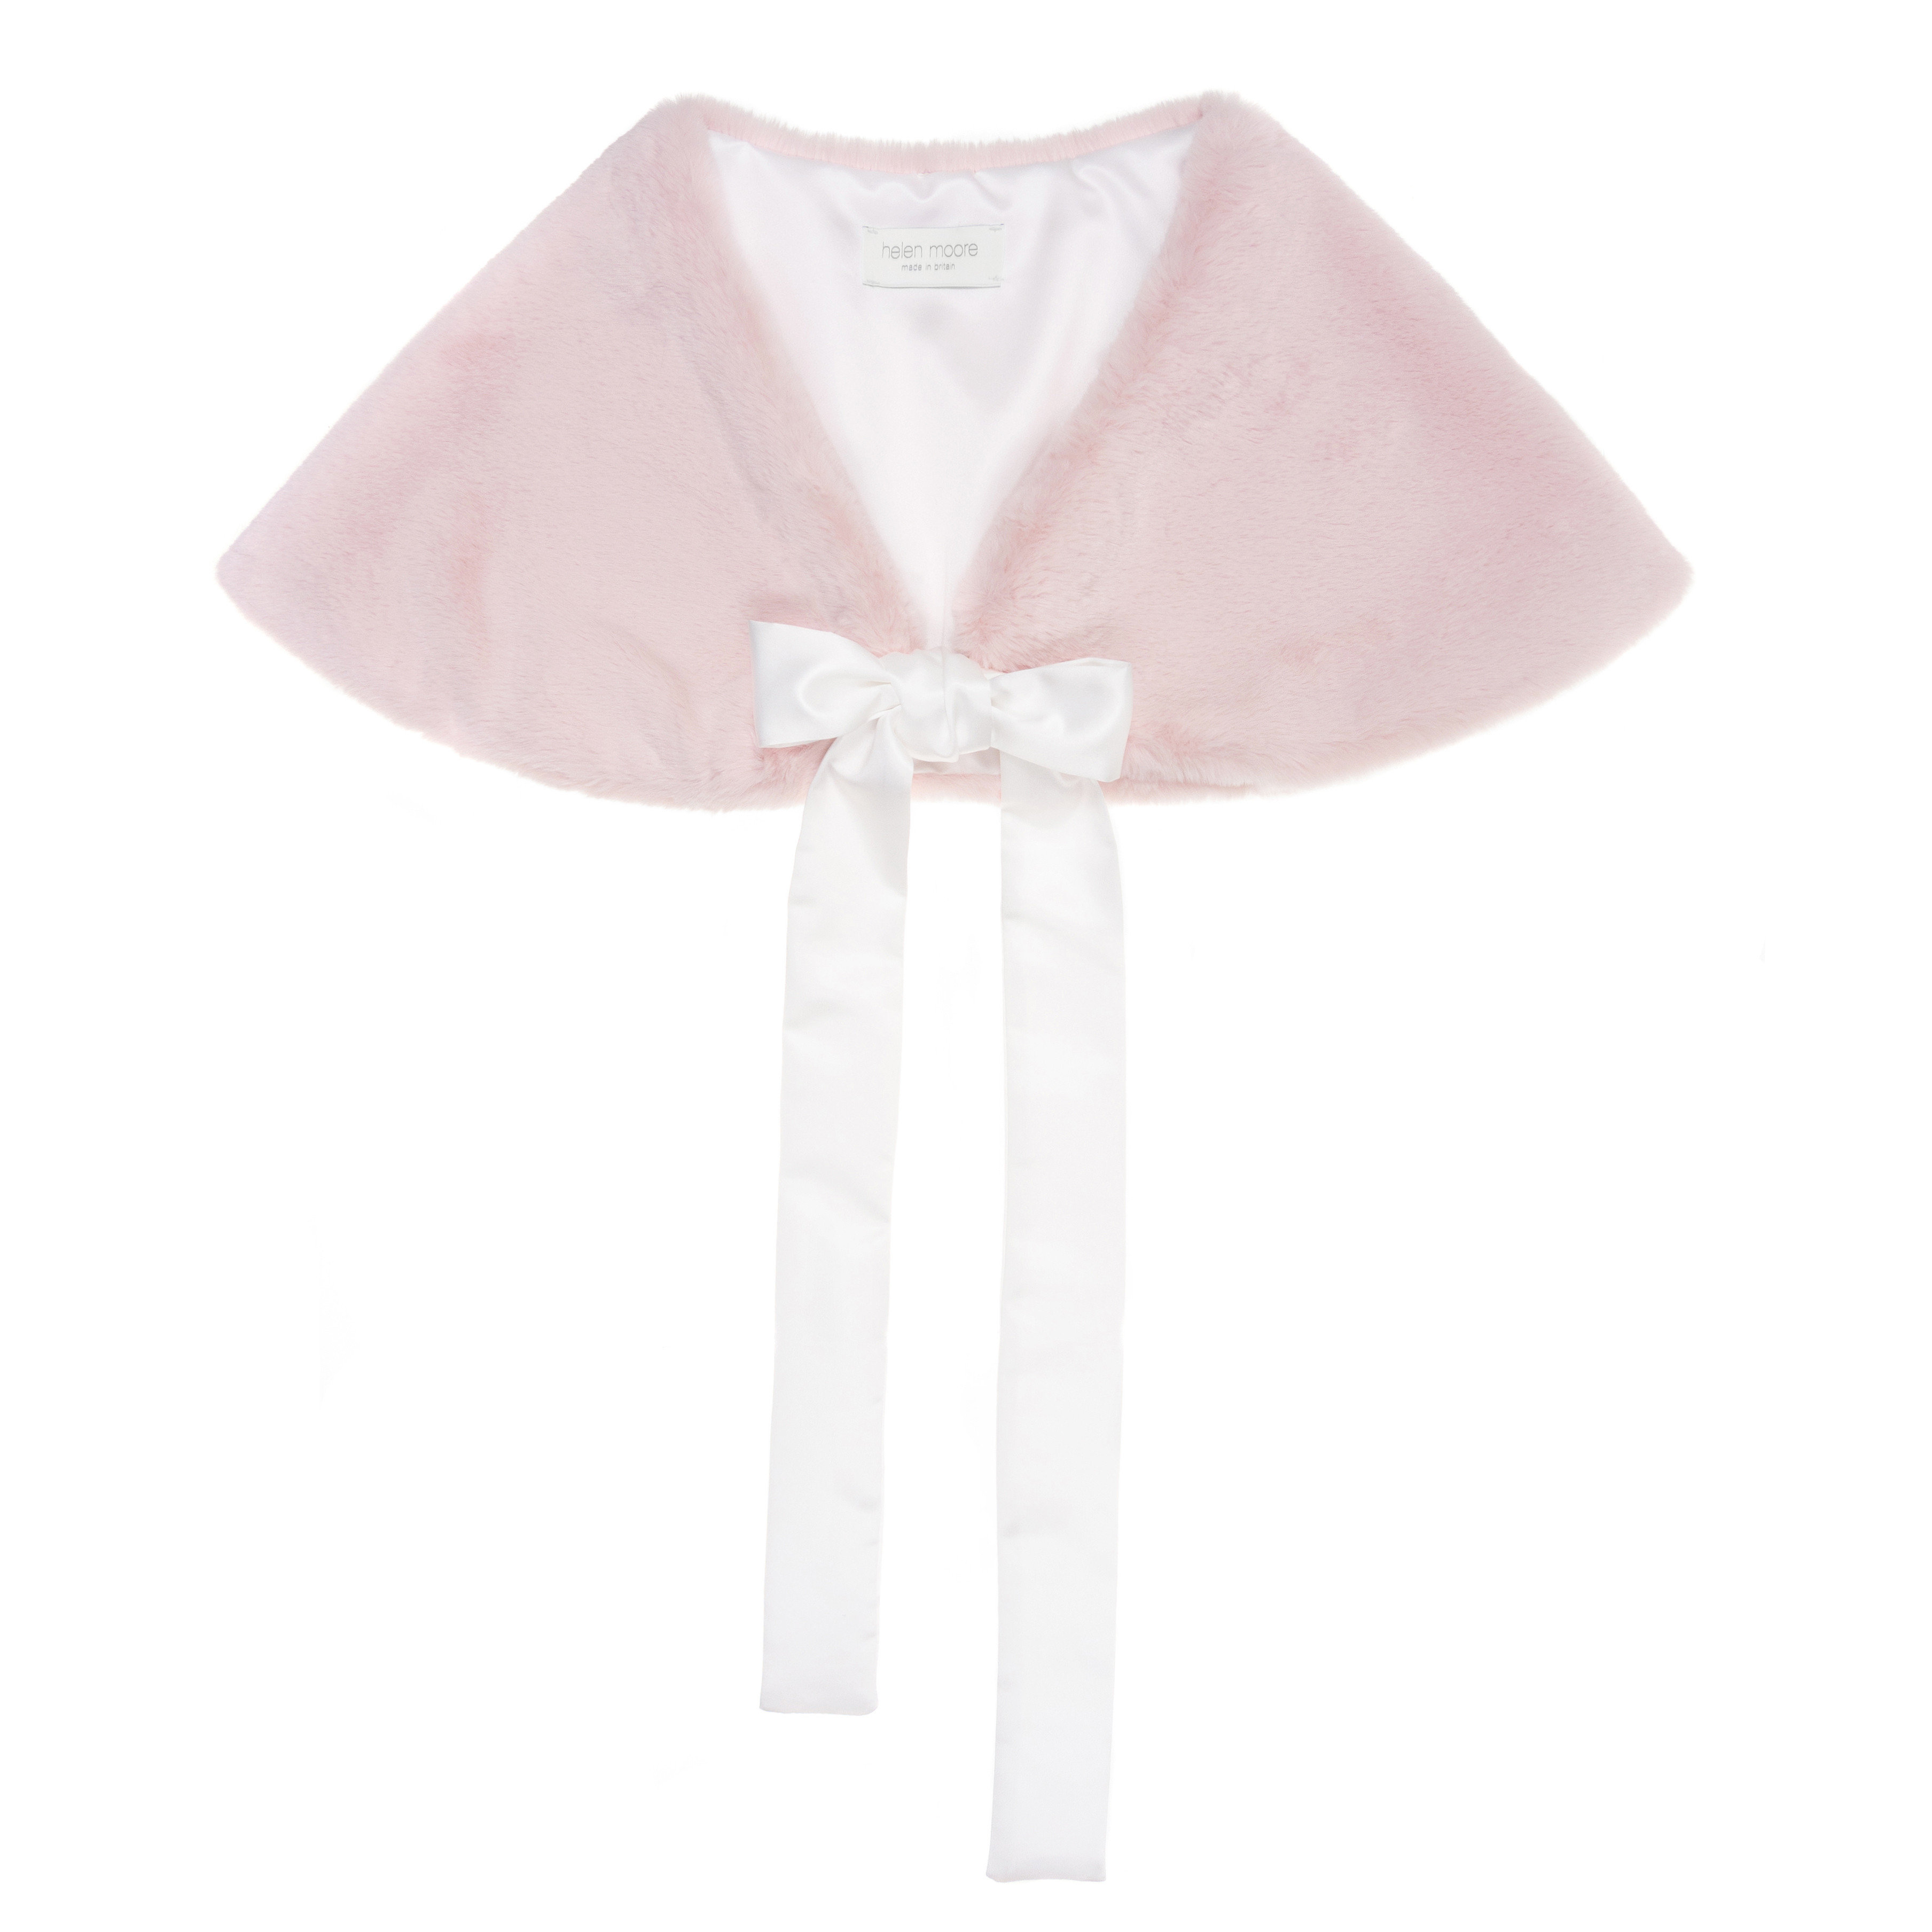 Helen Moore Bridal Shoulder Wrap pink 4GJDXXE2H14SJ